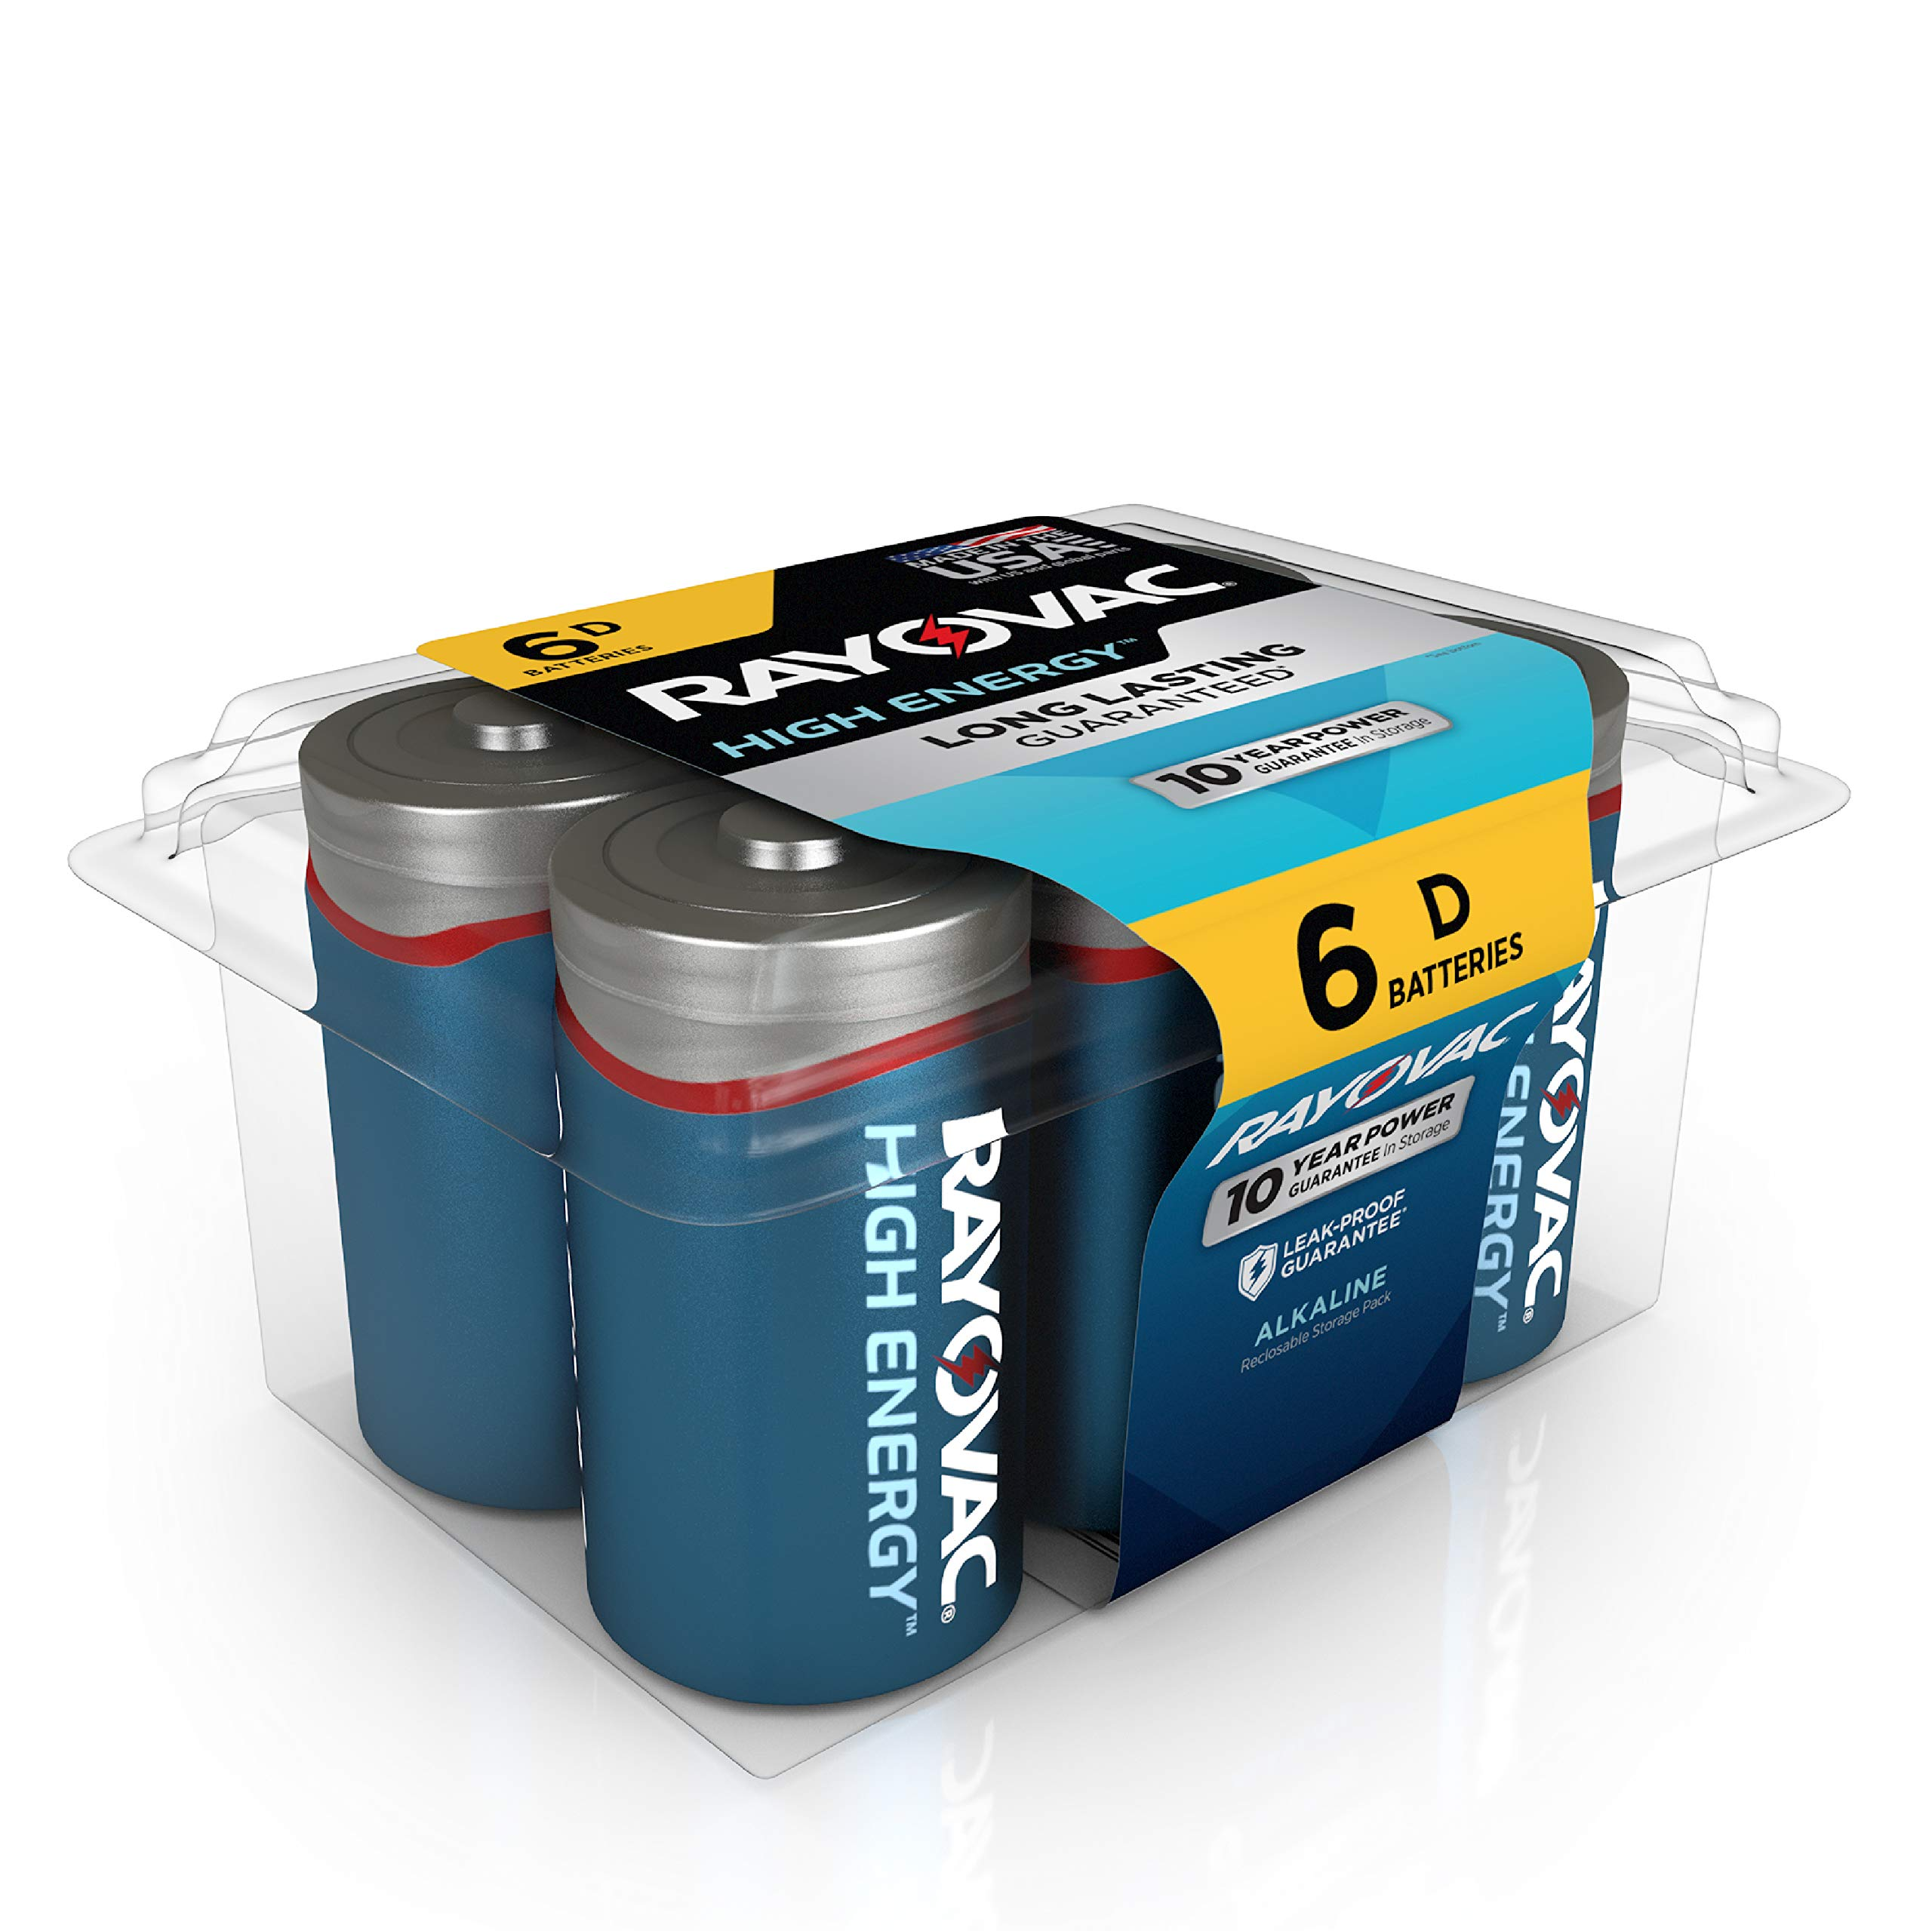 RAYOVAC 6 Pack Alkaline Batteries 813 6PPK